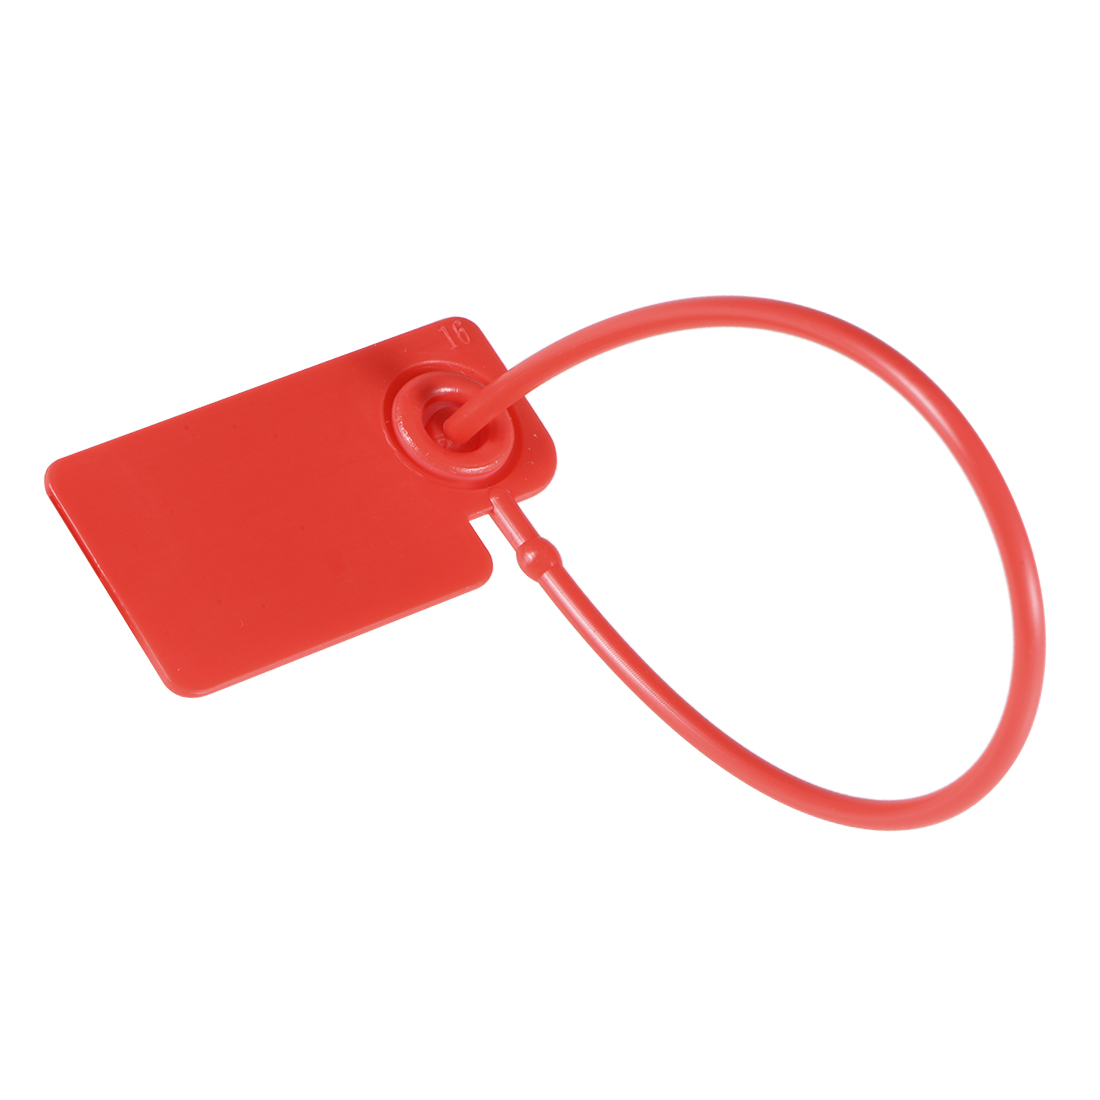 Plastic Zip Ties Seals Anti-Tamper 165mm Length, Red, Pack of 50